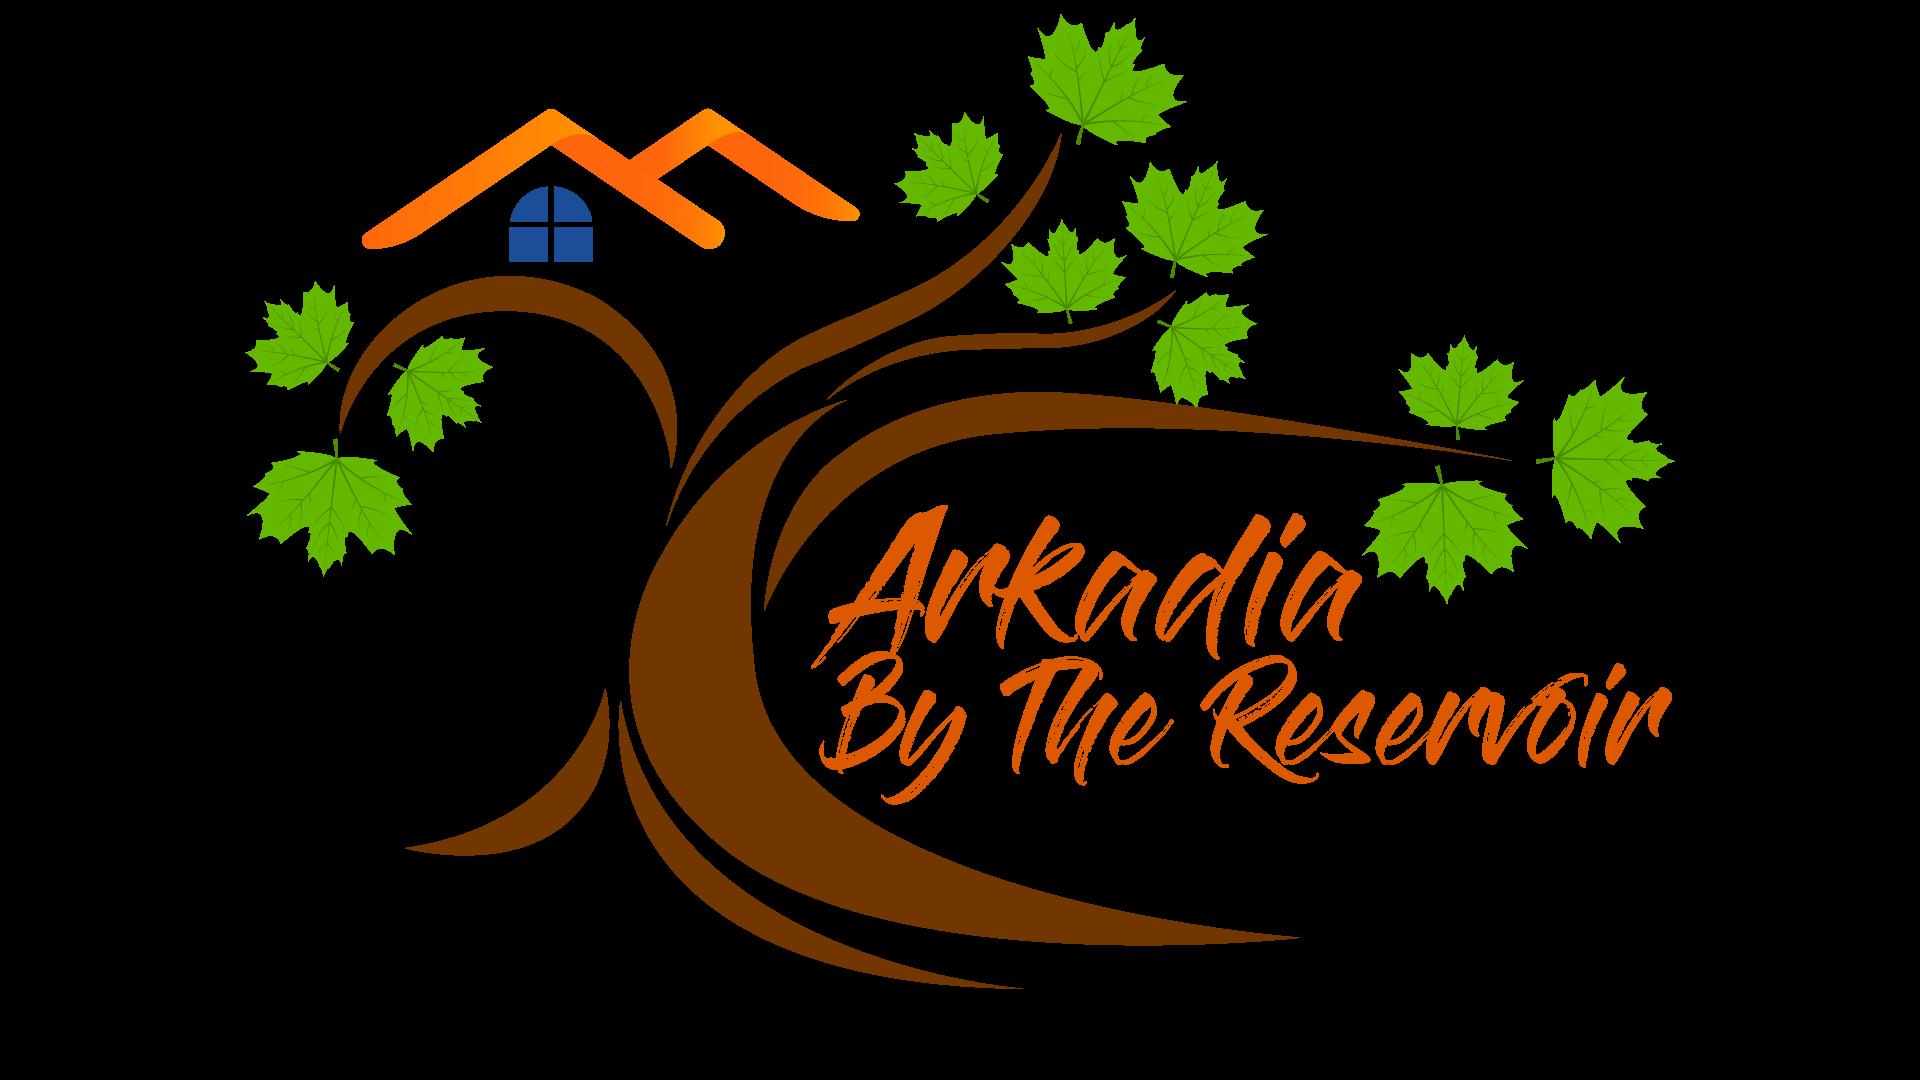 Arkadia Cottages